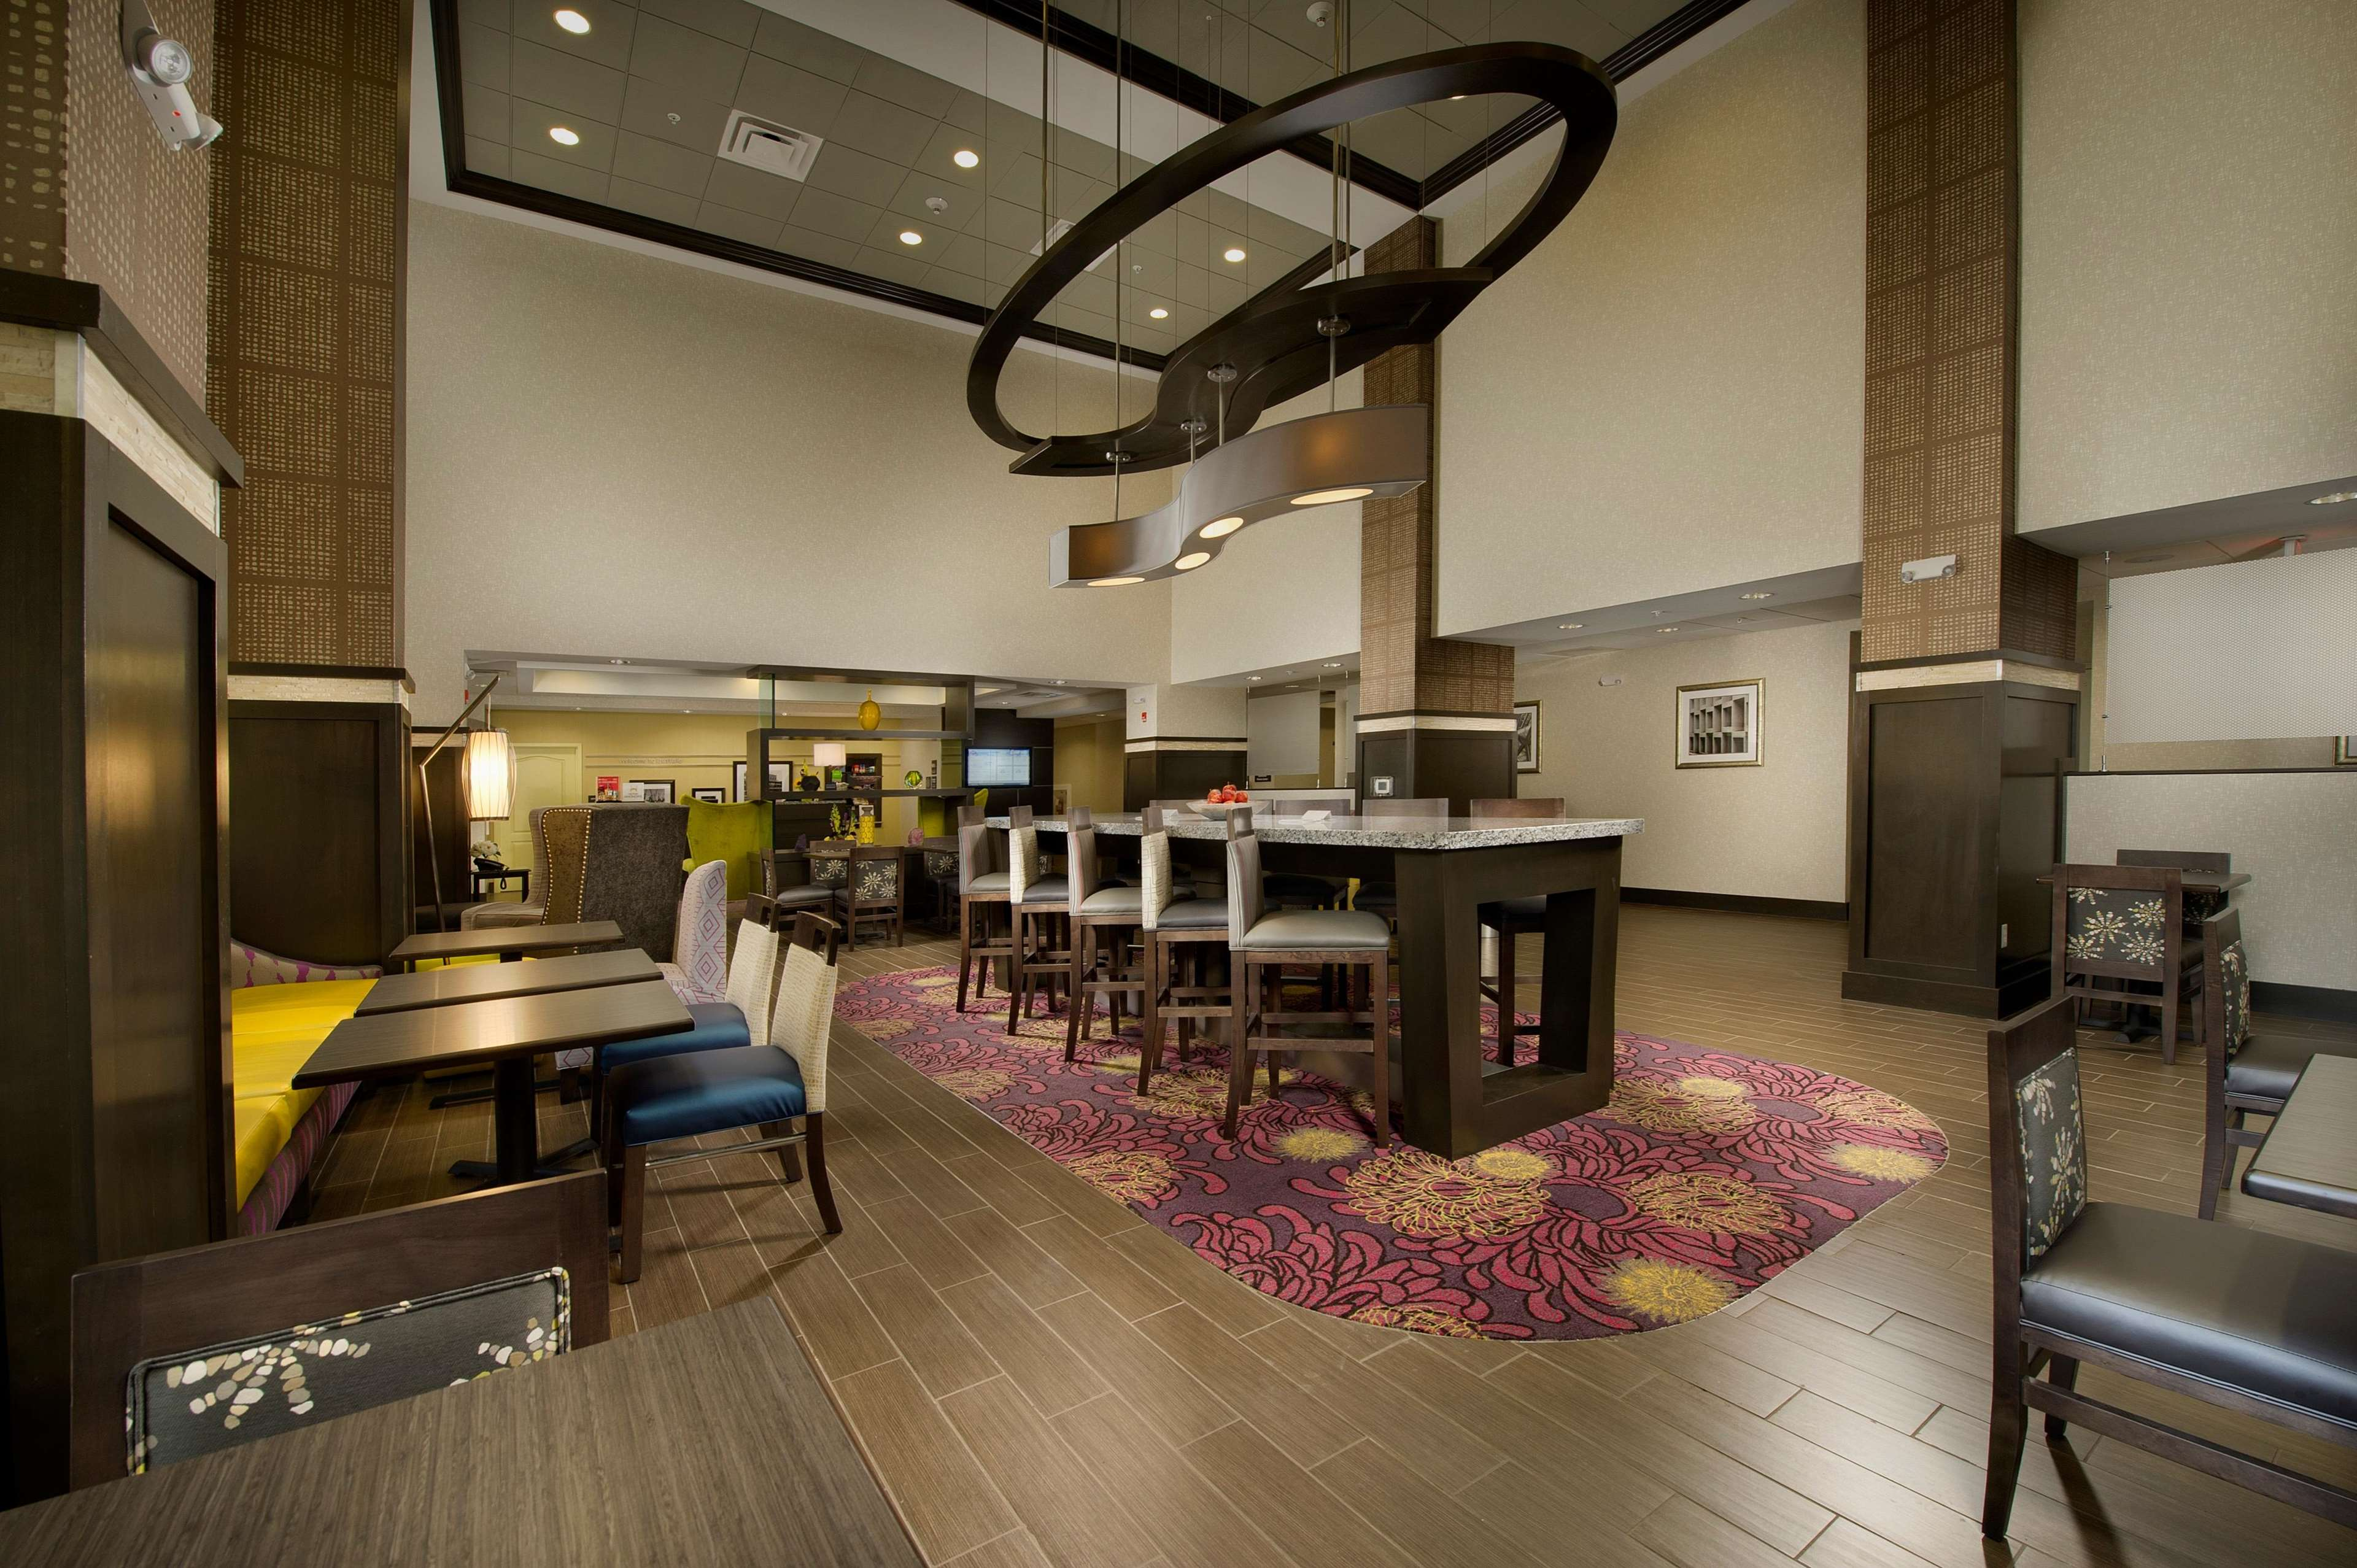 Hampton Inn & Suites Buffalo Airport image 3